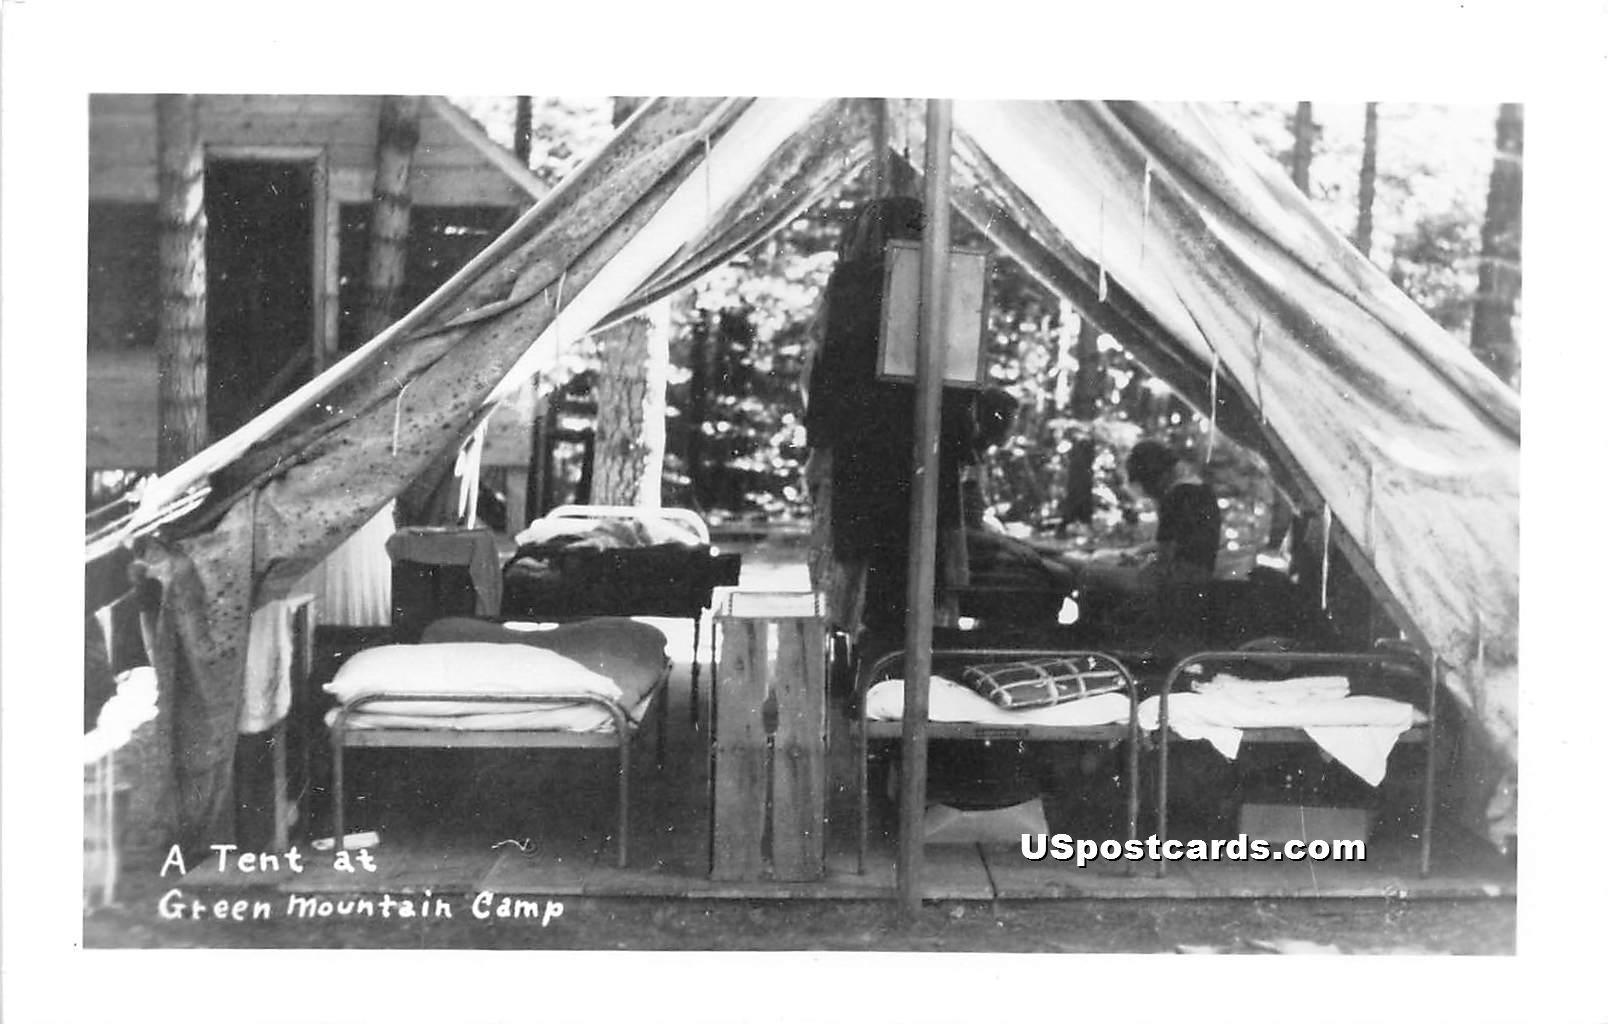 Tent - Green Mountain Camp, Vermont VT Postcard